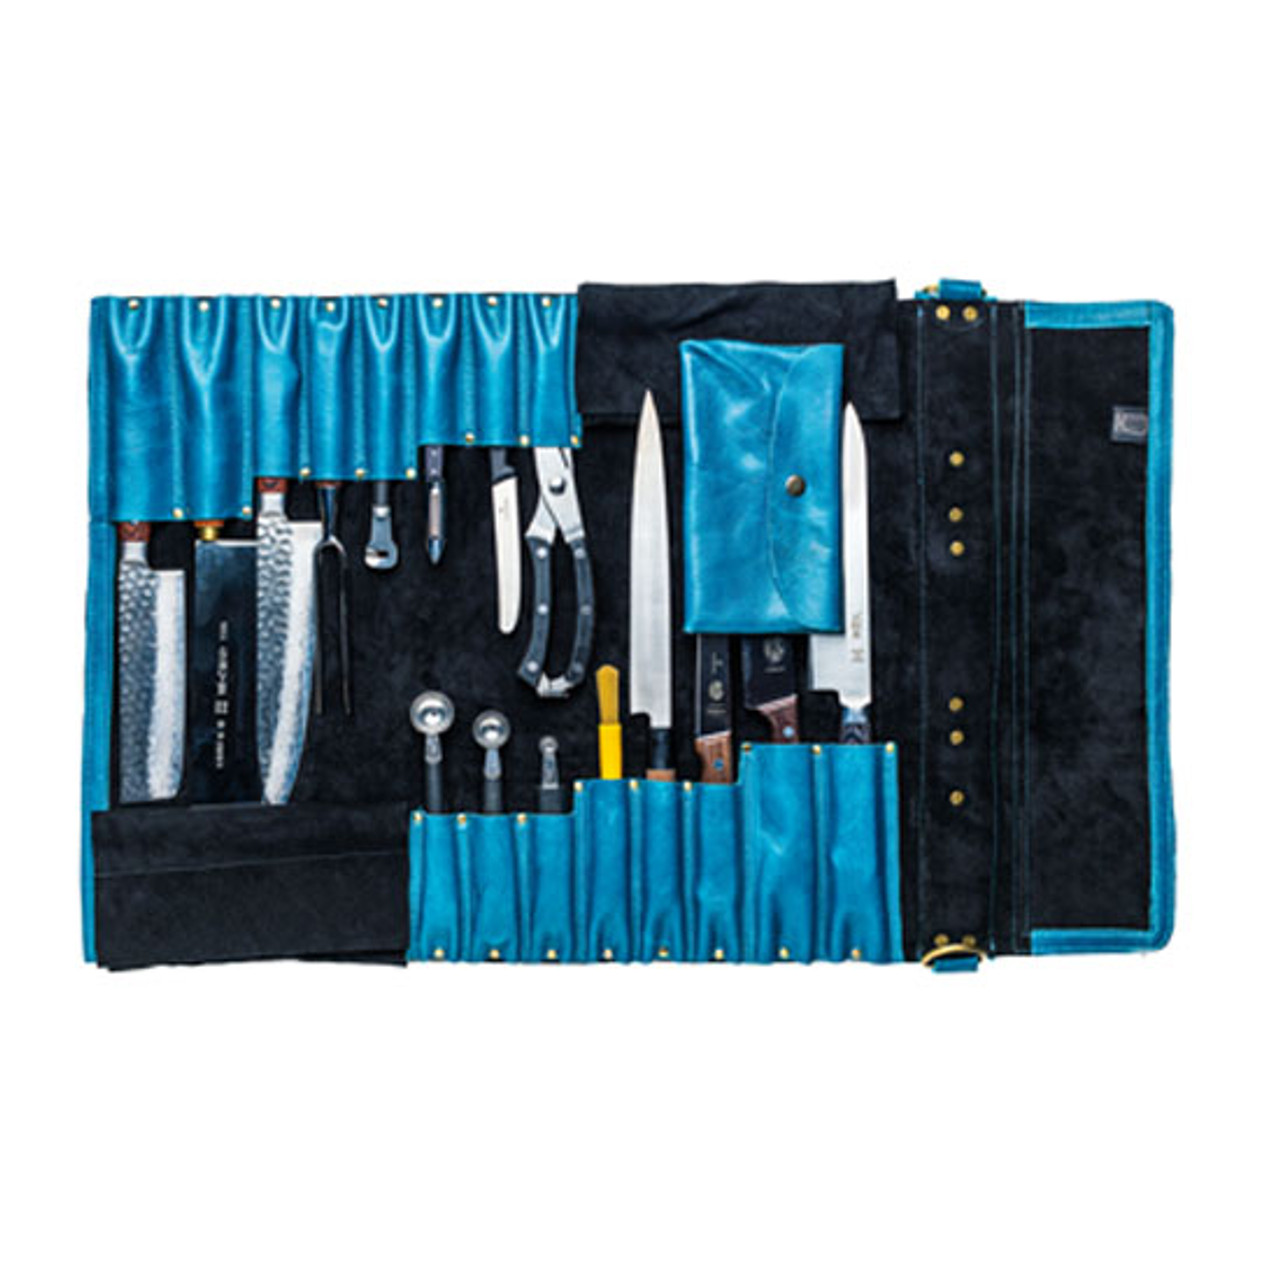 Chefi Leather Knife Roll - Blue